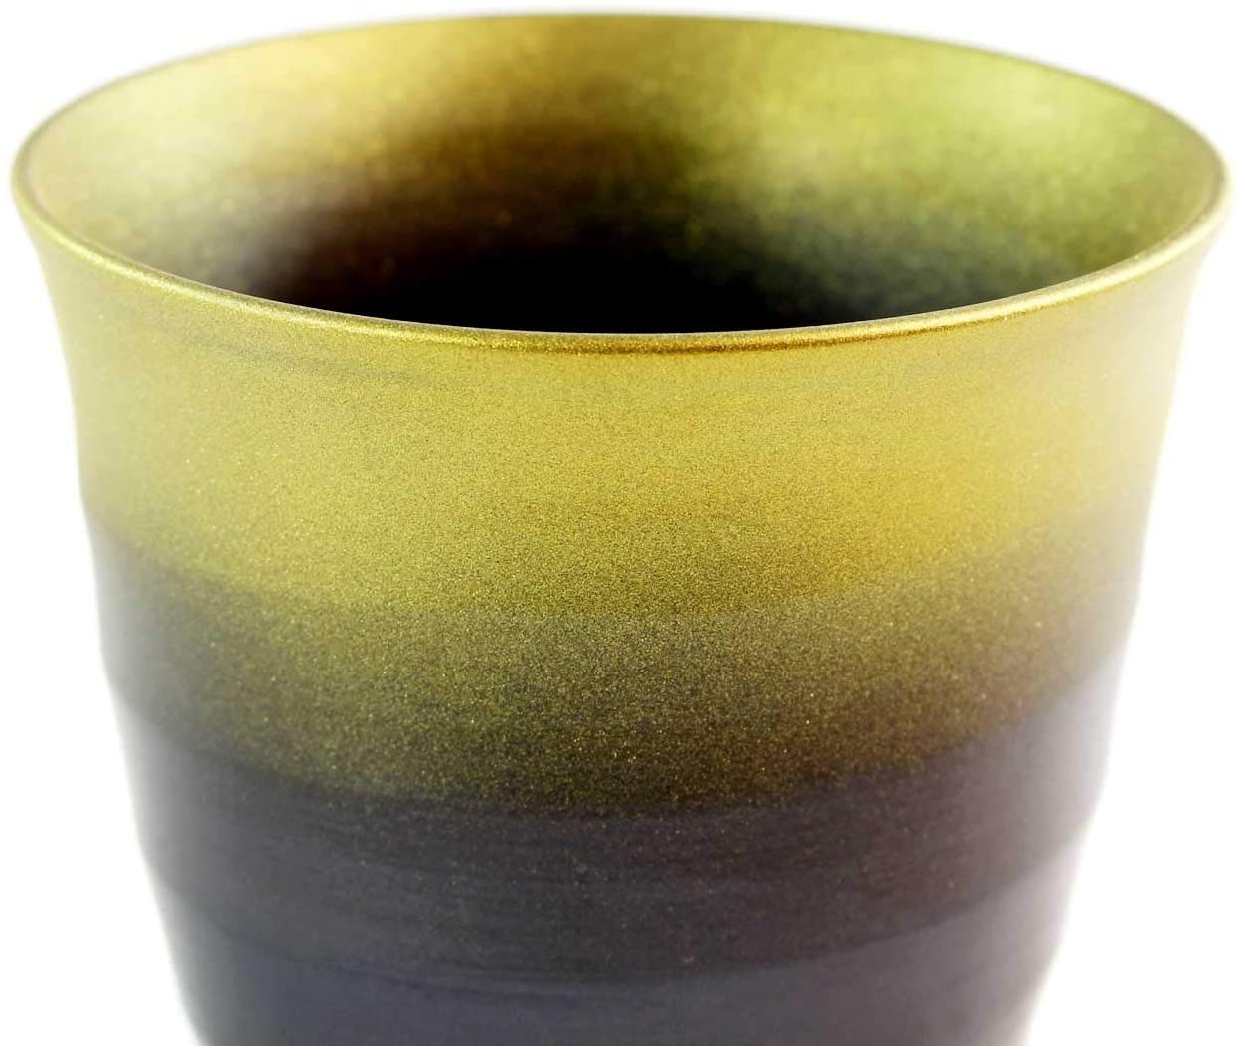 藤井錦彩窯 窯変金彩焼酎カップの商品画像4